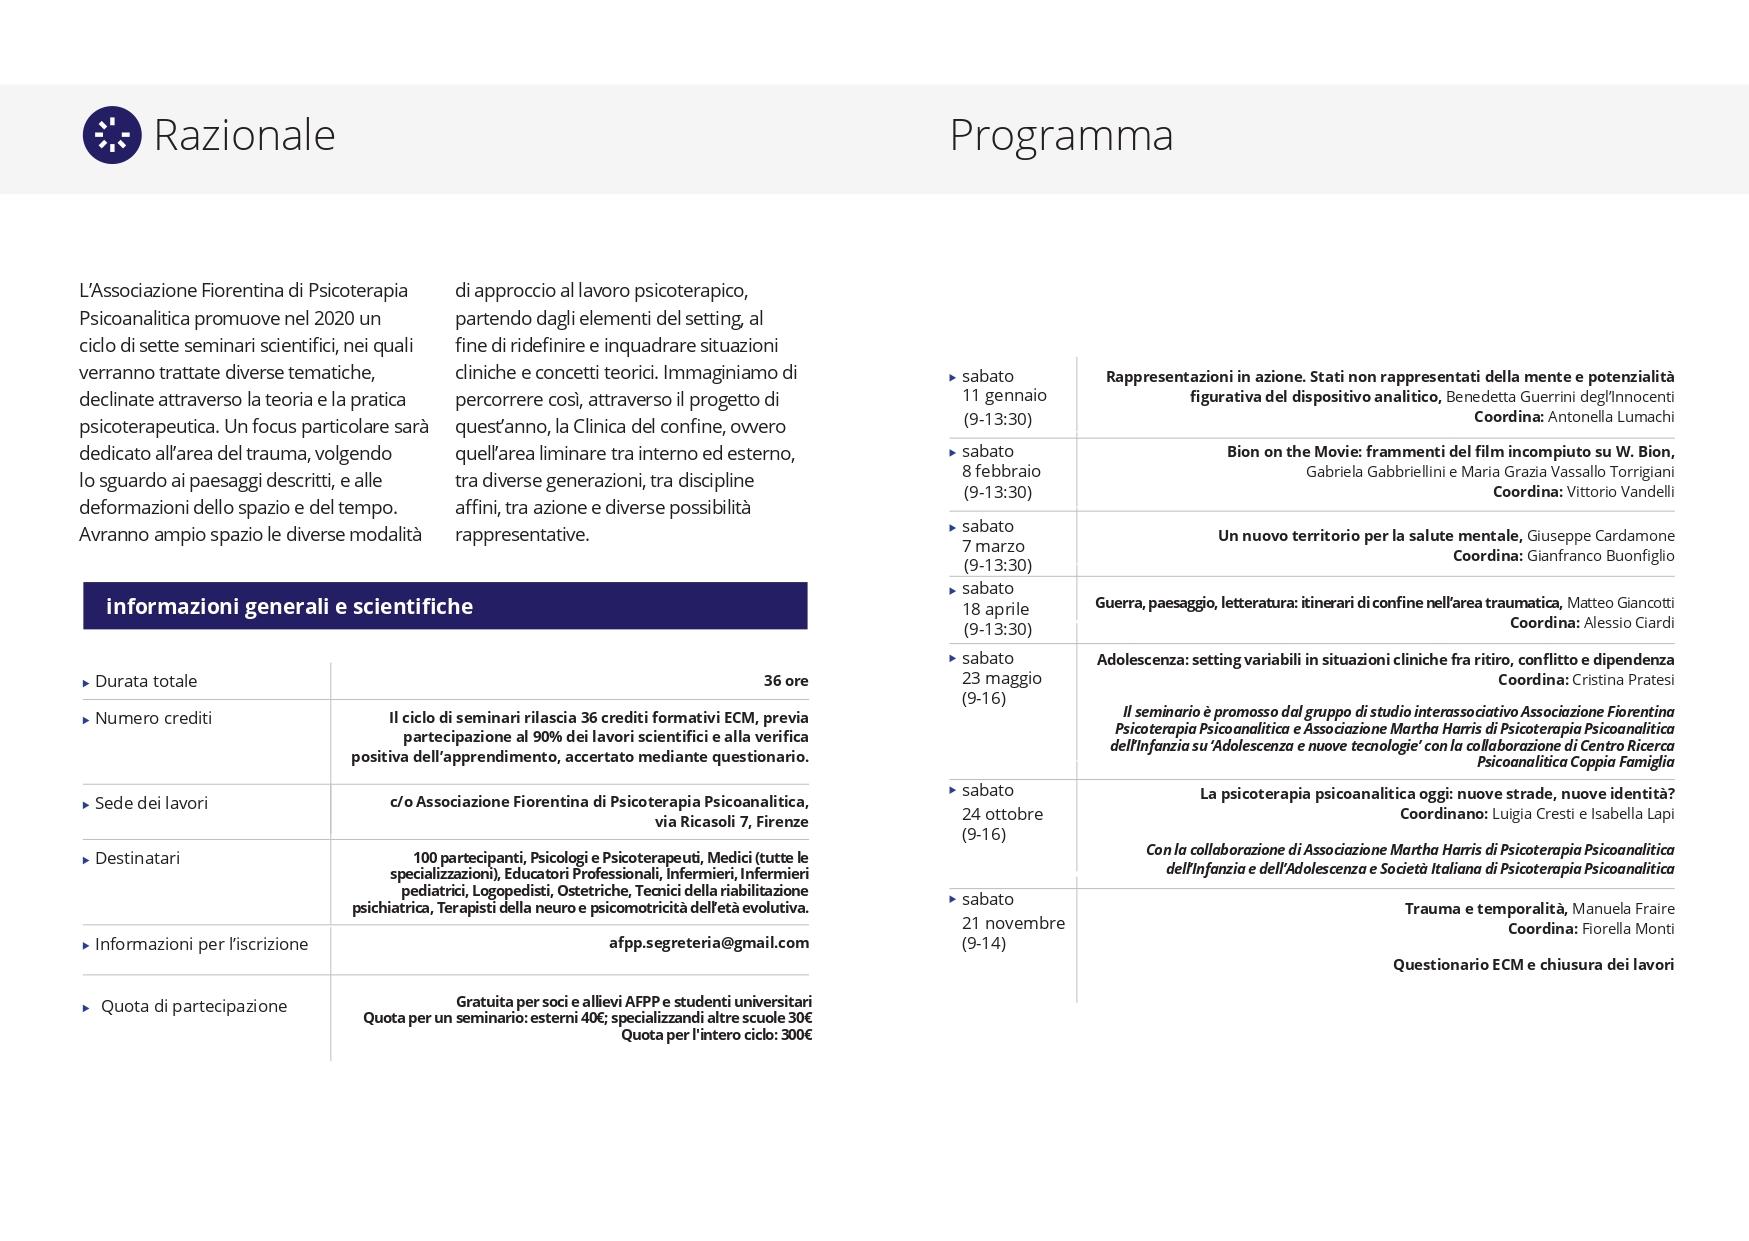 brochure-clinica-del-confine_rev3_page-0002